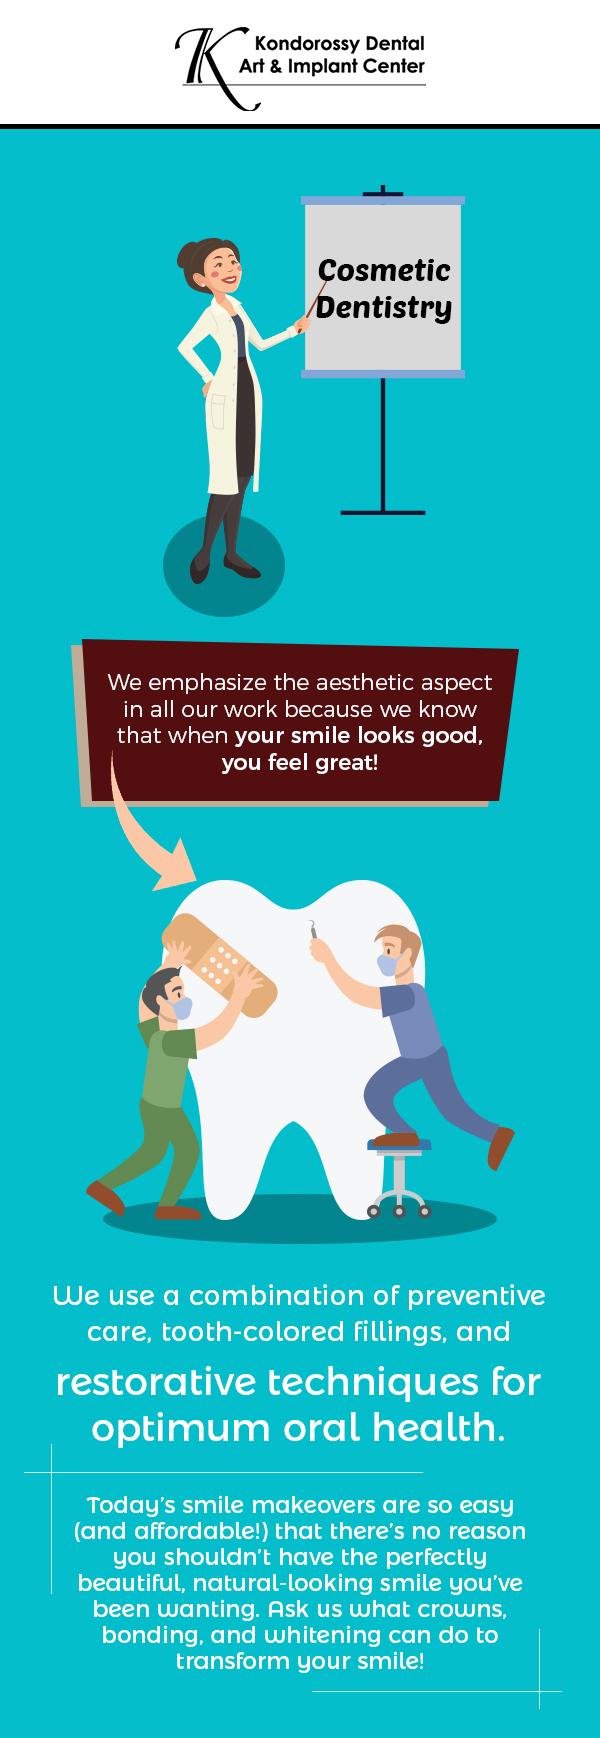 Kondorossy Dental – A Professional Cosmetic Dentistry in Somerset, NJ